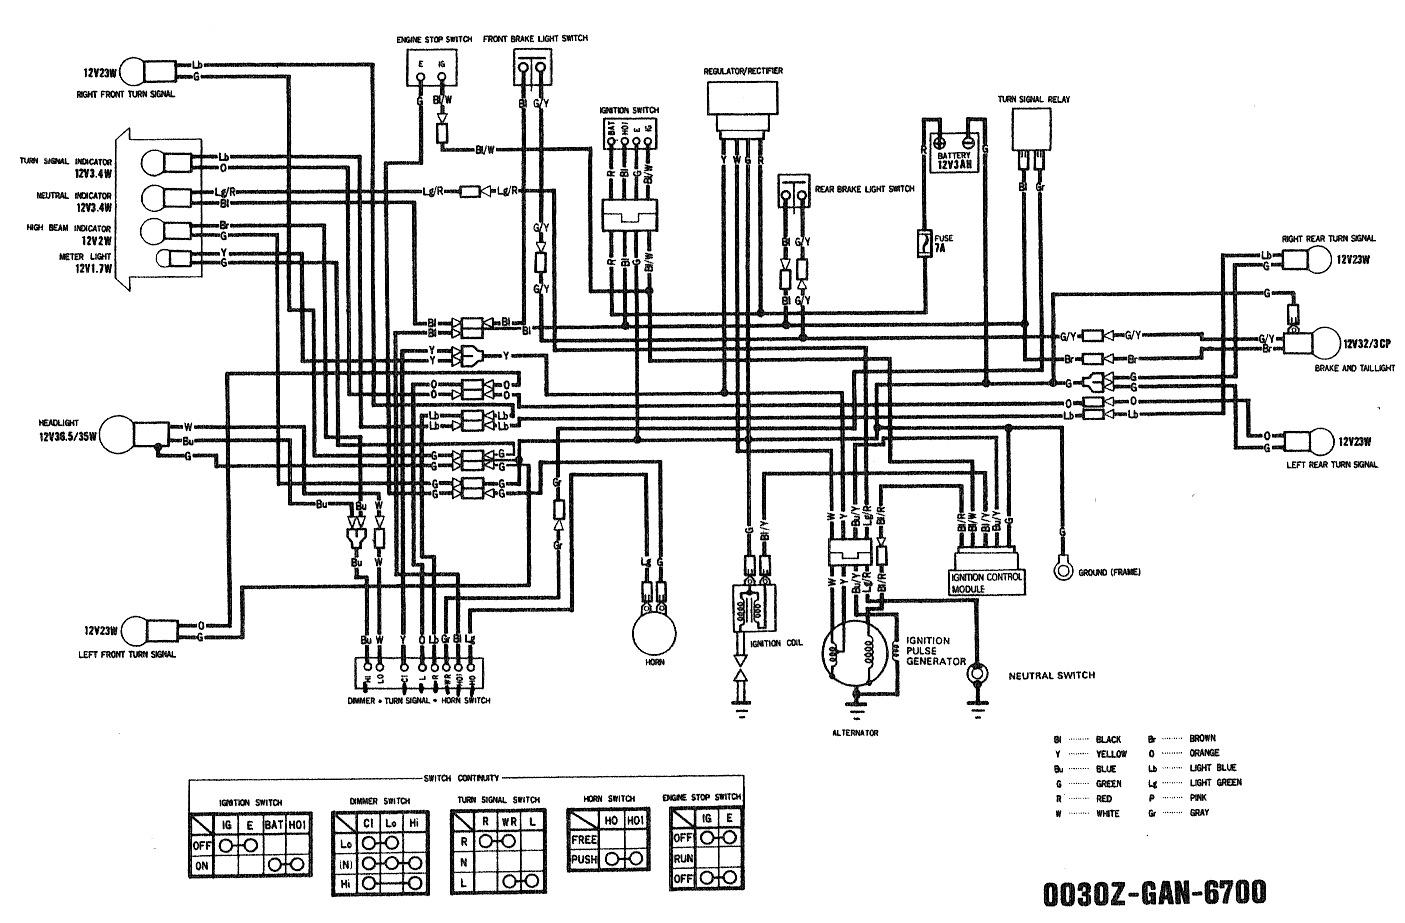 1982 ct70 wiring diagram #2 Atc90 Wiring Diagram 1982 ct70 wiring diagram